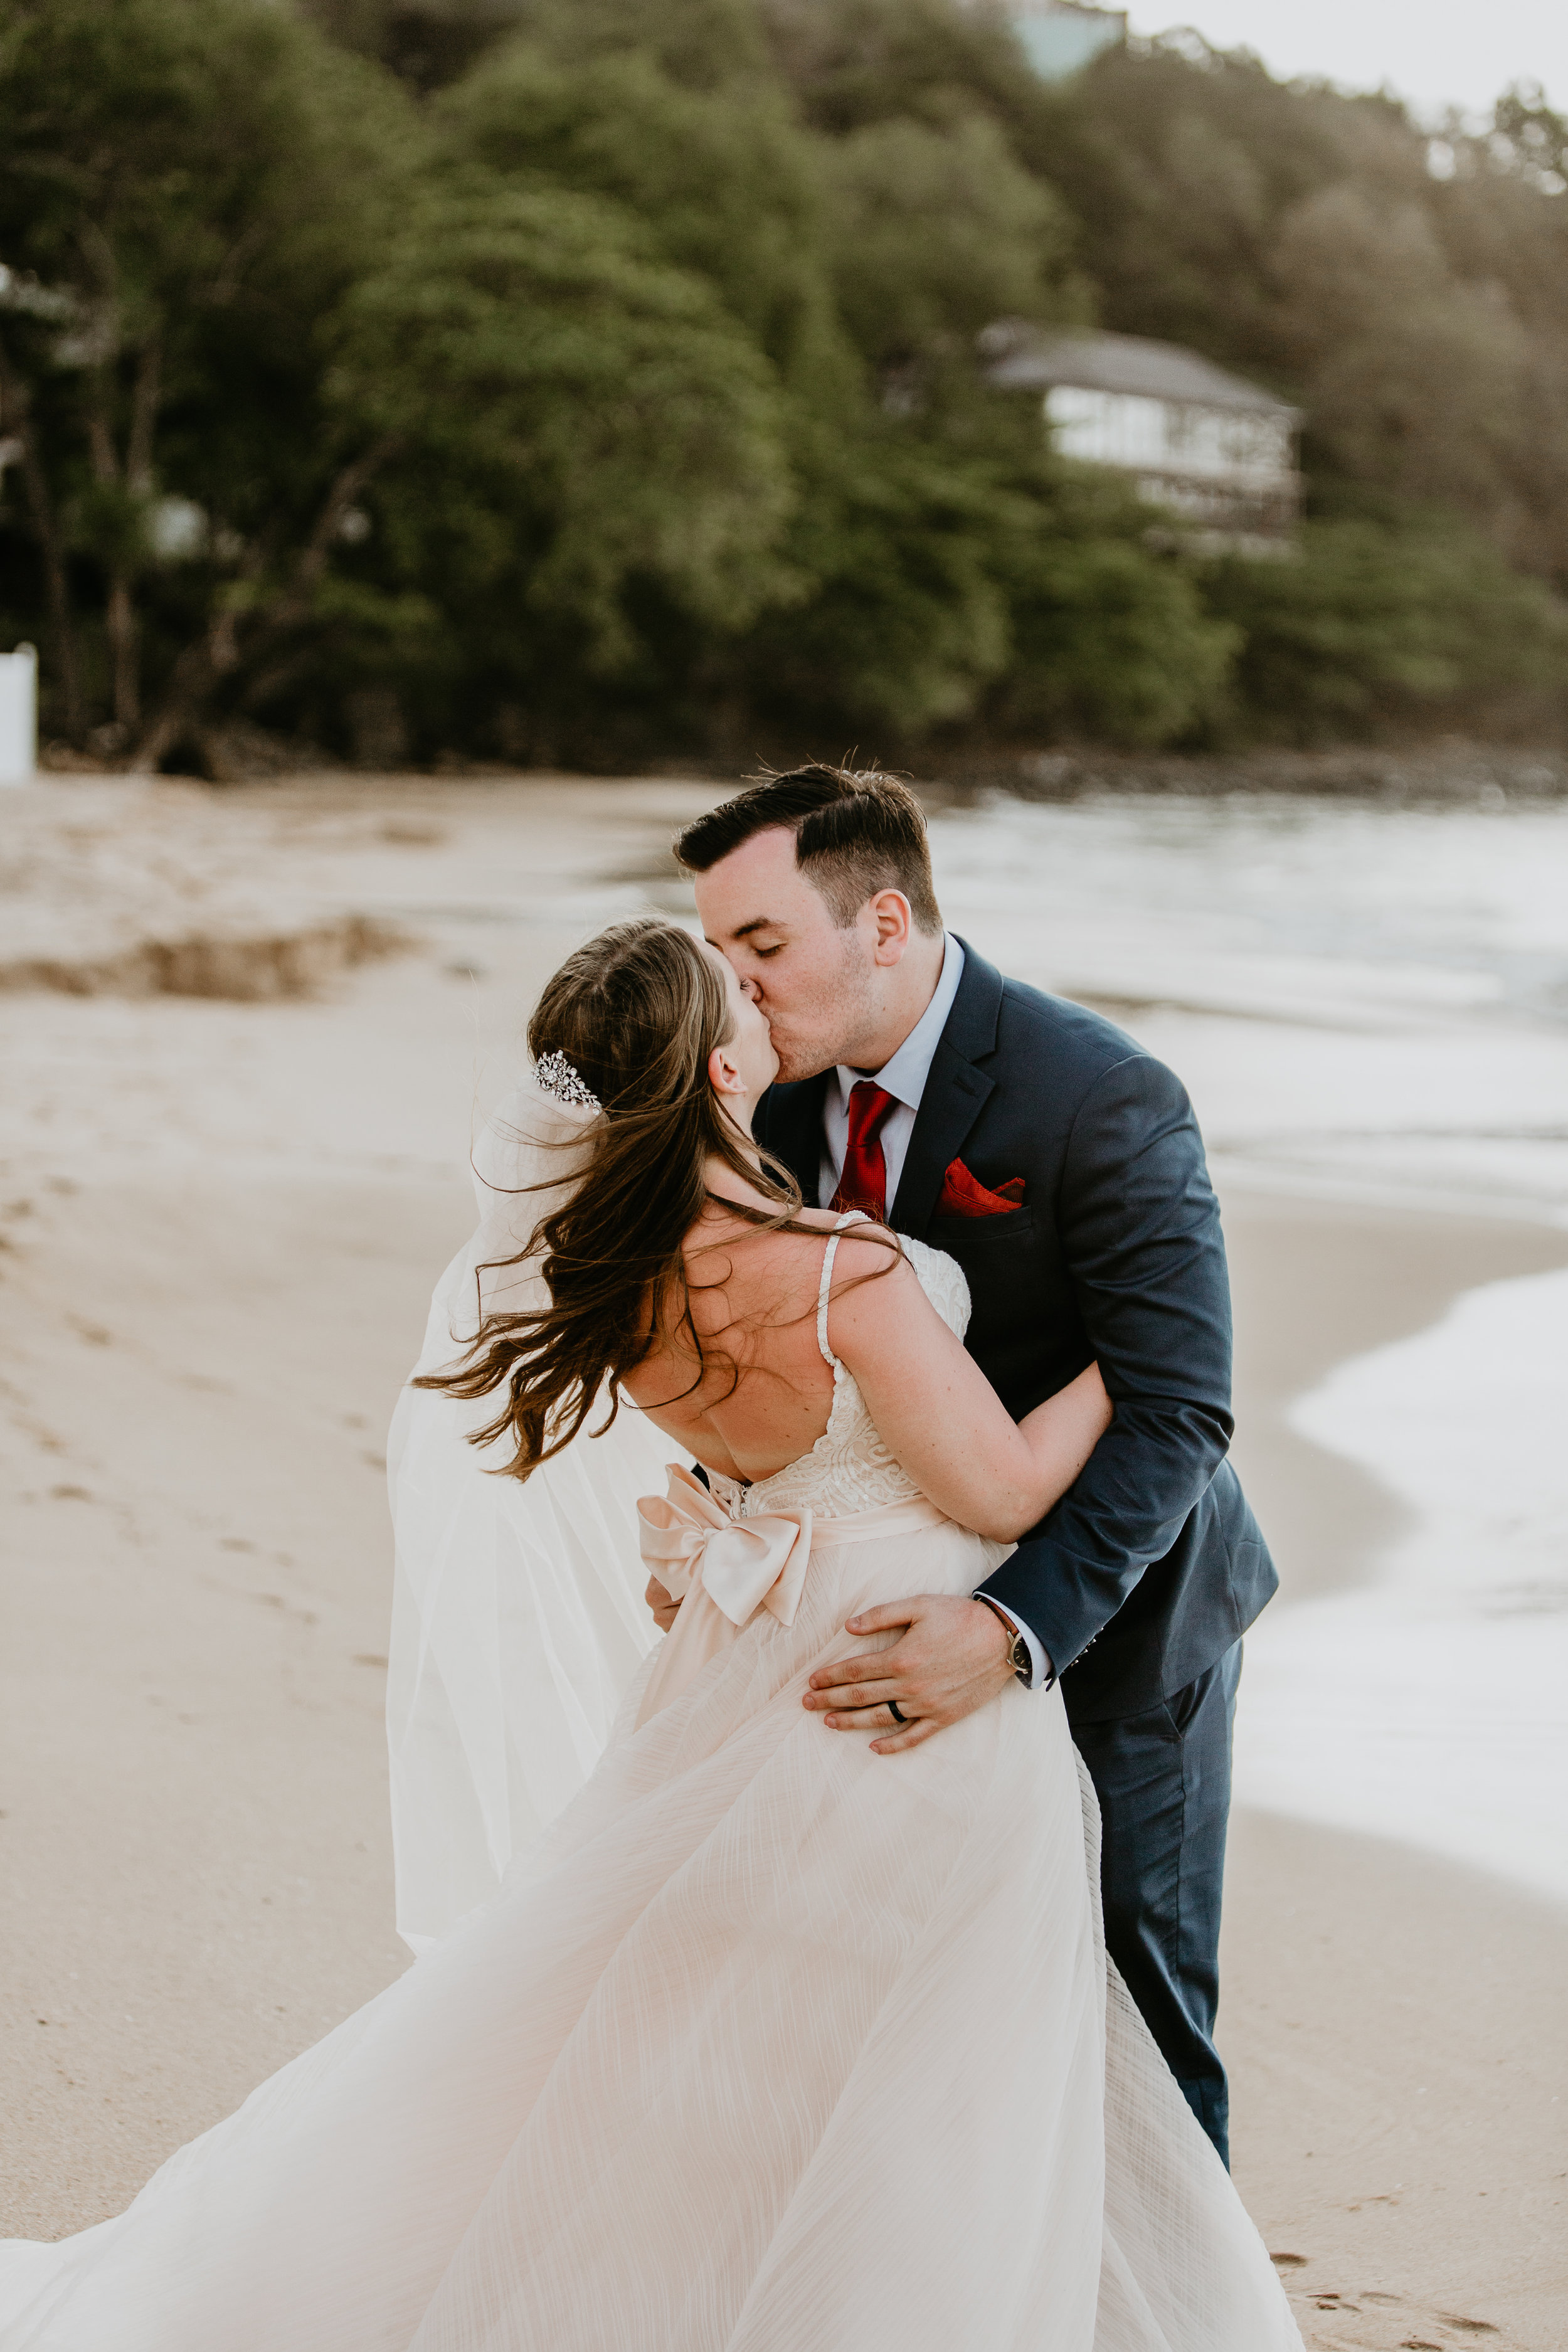 nicole-daacke-photography-destination-wedding-in-st-lucia-sandals-la-toc-intimate-island-wedding-carribean-elopement-photographer-chill-island-wedding-90.jpg